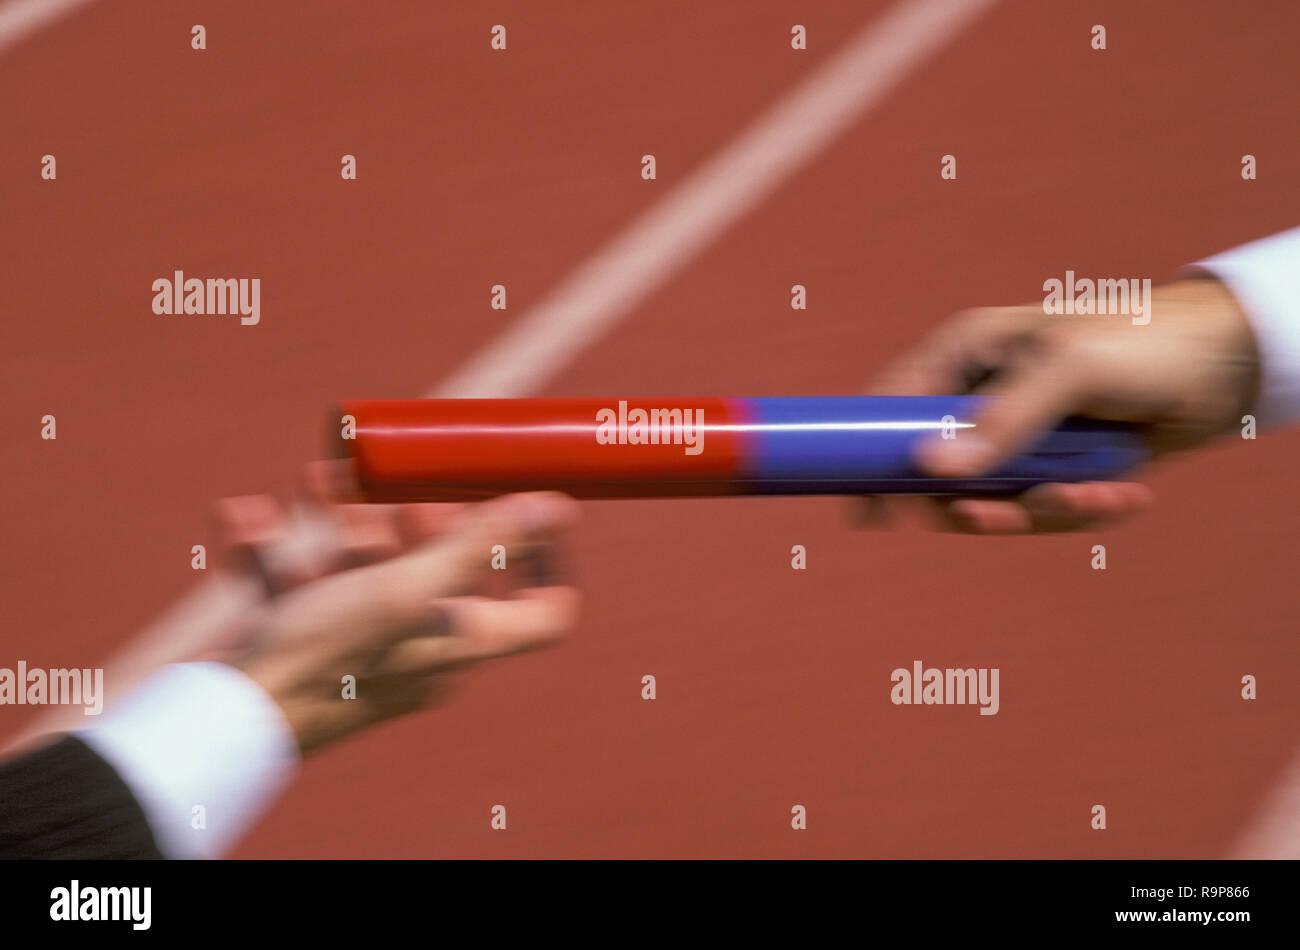 Businessmen passing the baton on running track, USA - Stock Image